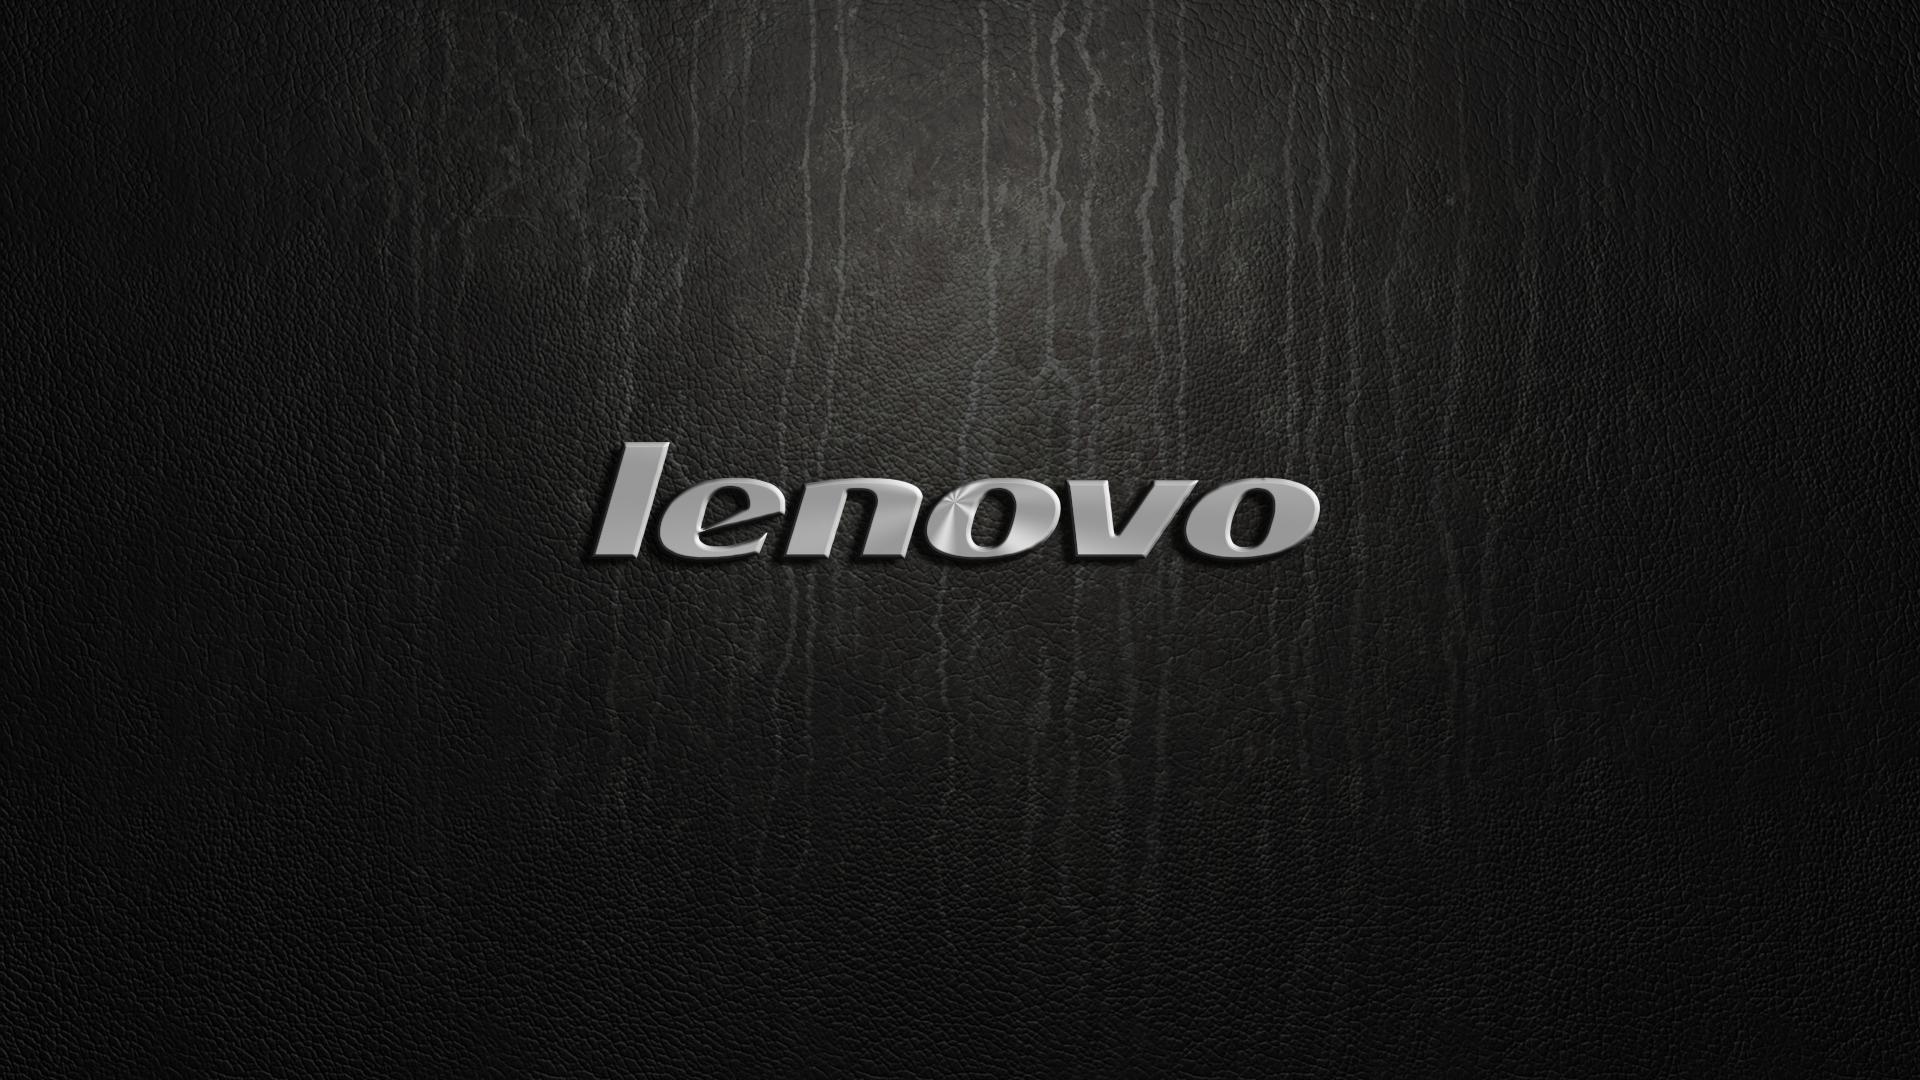 Fonds dcran Lenovo tous les wallpapers Lenovo 1920x1080